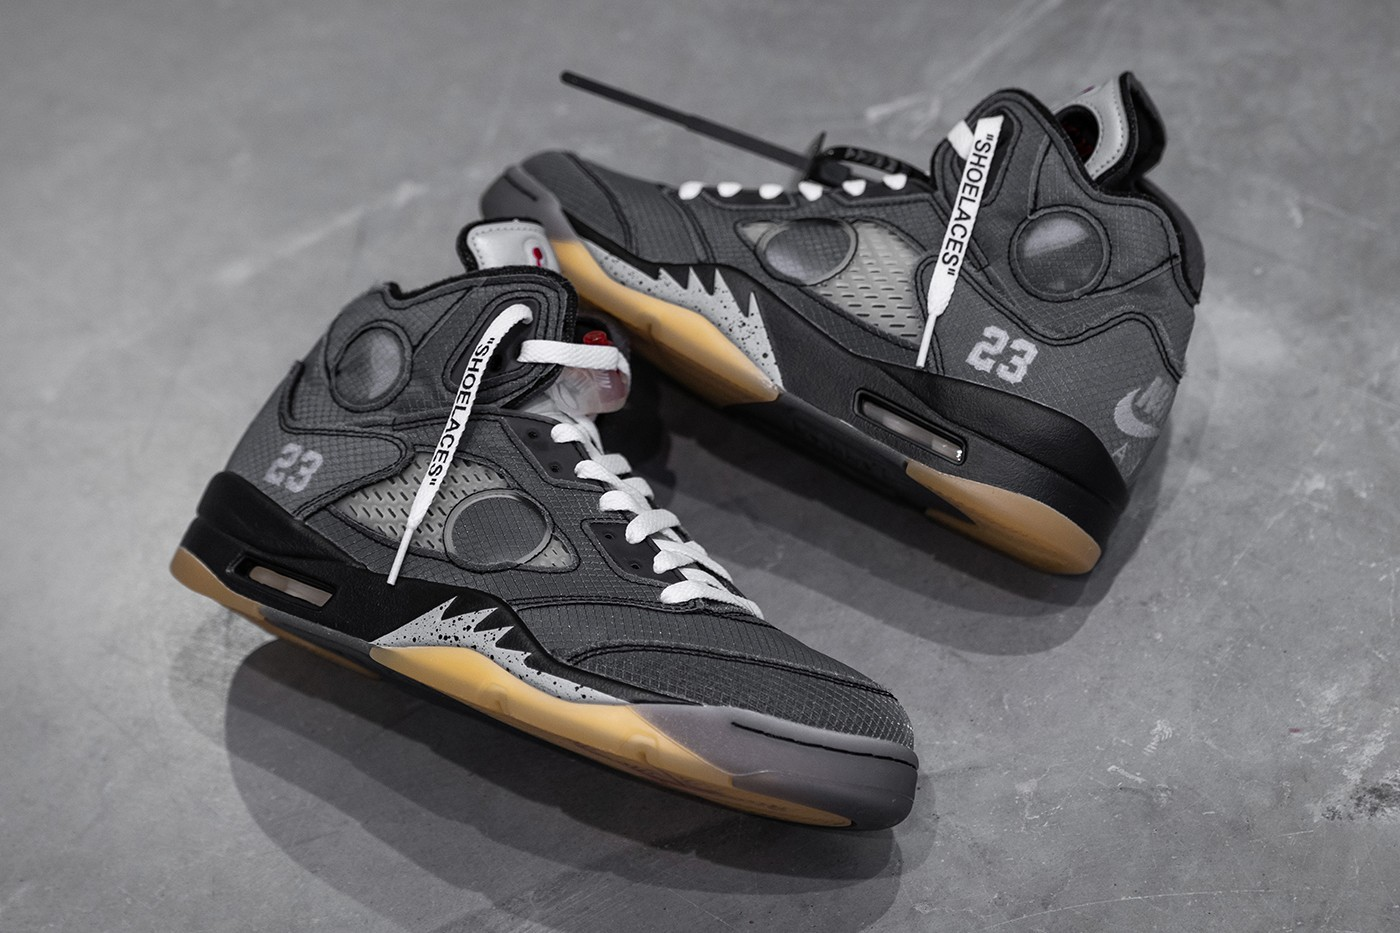 Virgil Abloh 親述 Off-White™ x Air Jordan 5 聯乘鞋款誕生過程